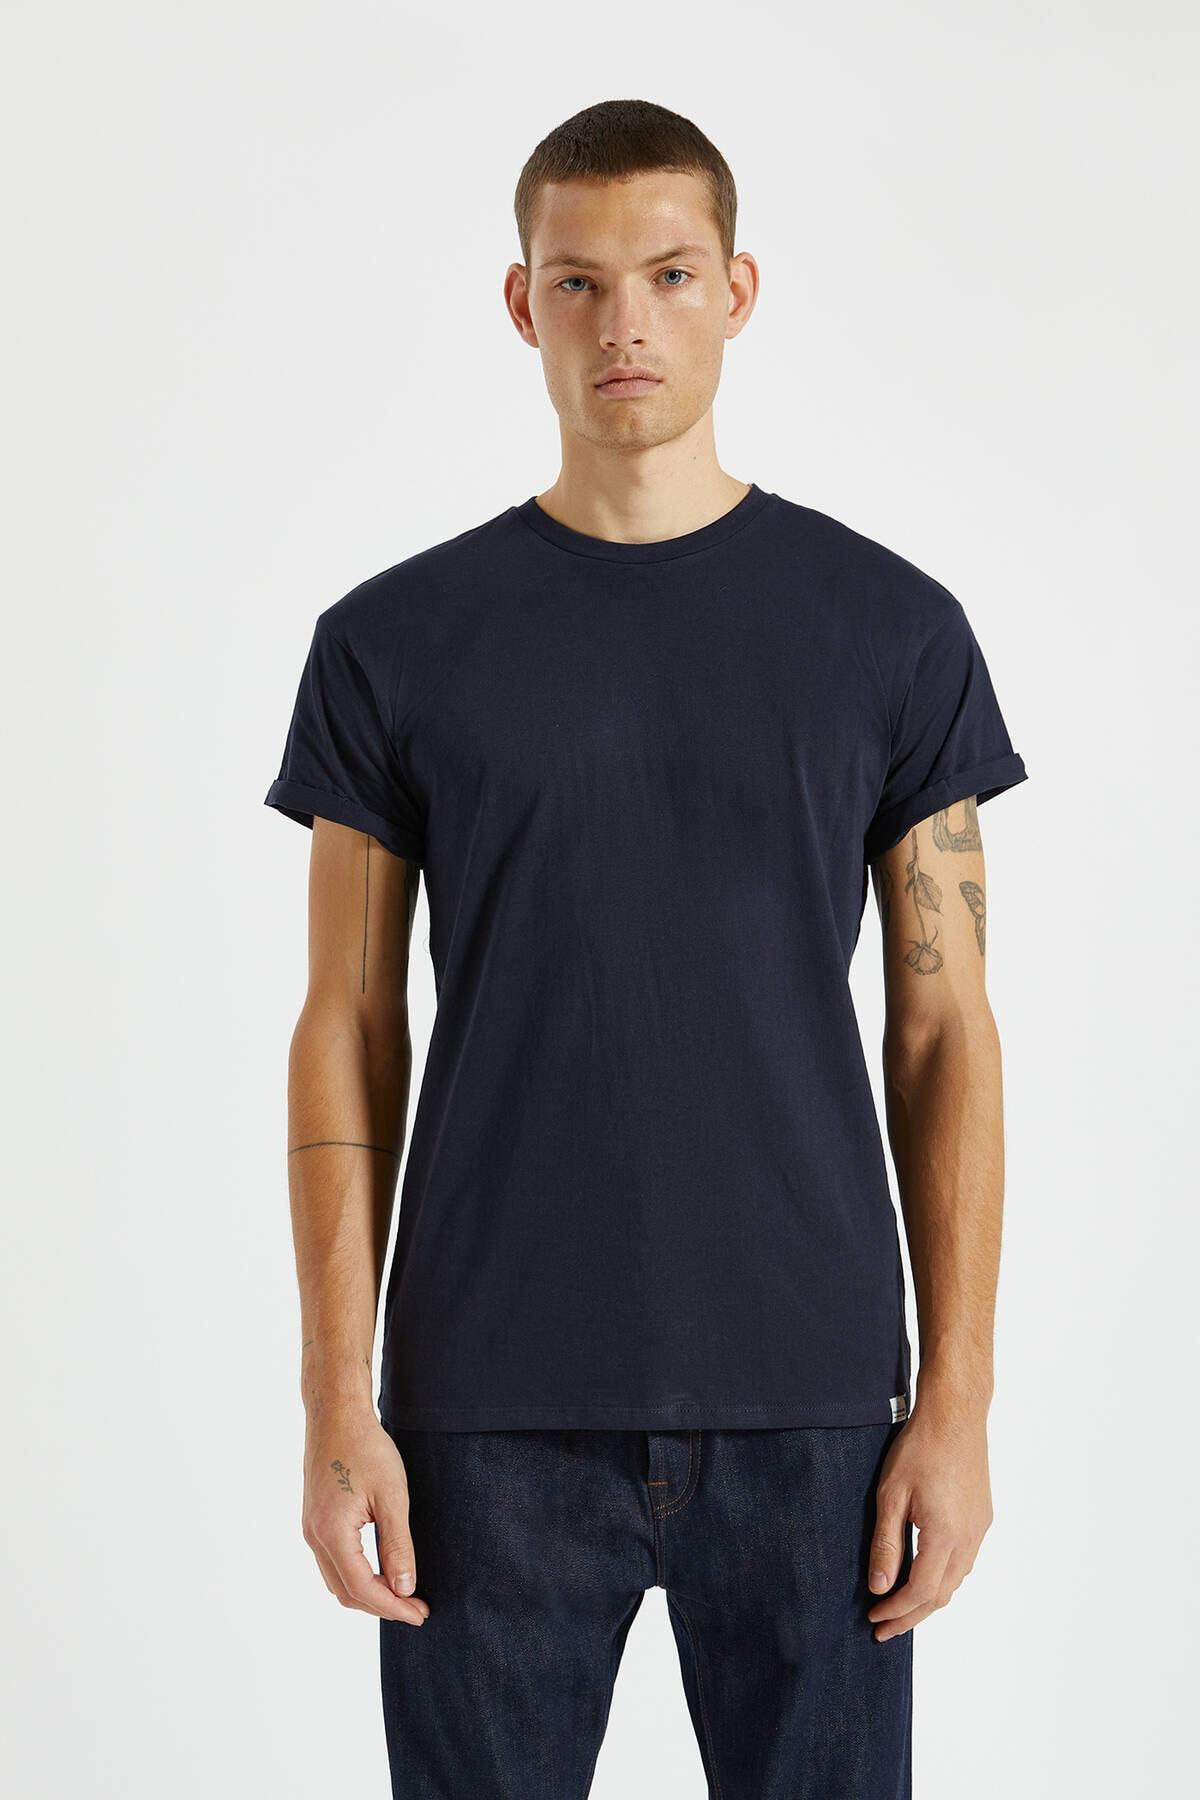 Pull & Bear Erkek Lacivert Logolu Basic Muscle Fit T-Shirt 09244941